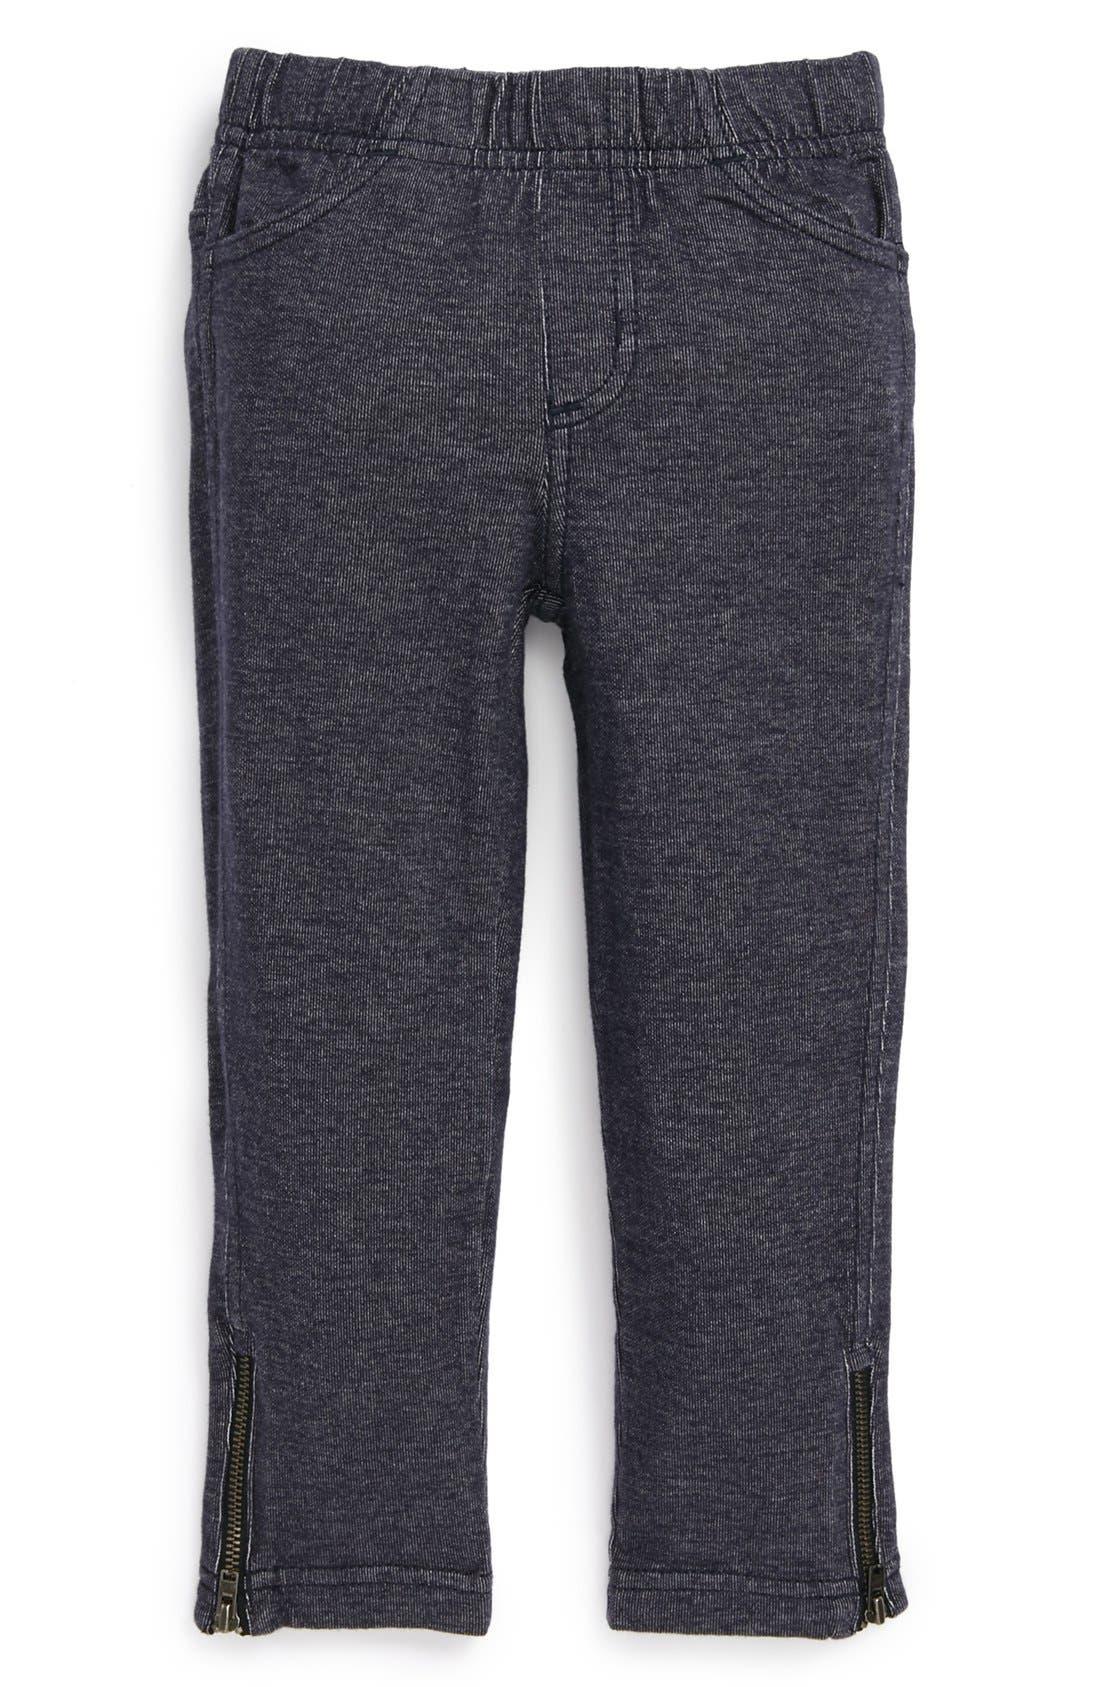 Alternate Image 1 Selected - Tea Collection Skinny Pants (Toddler Girls)